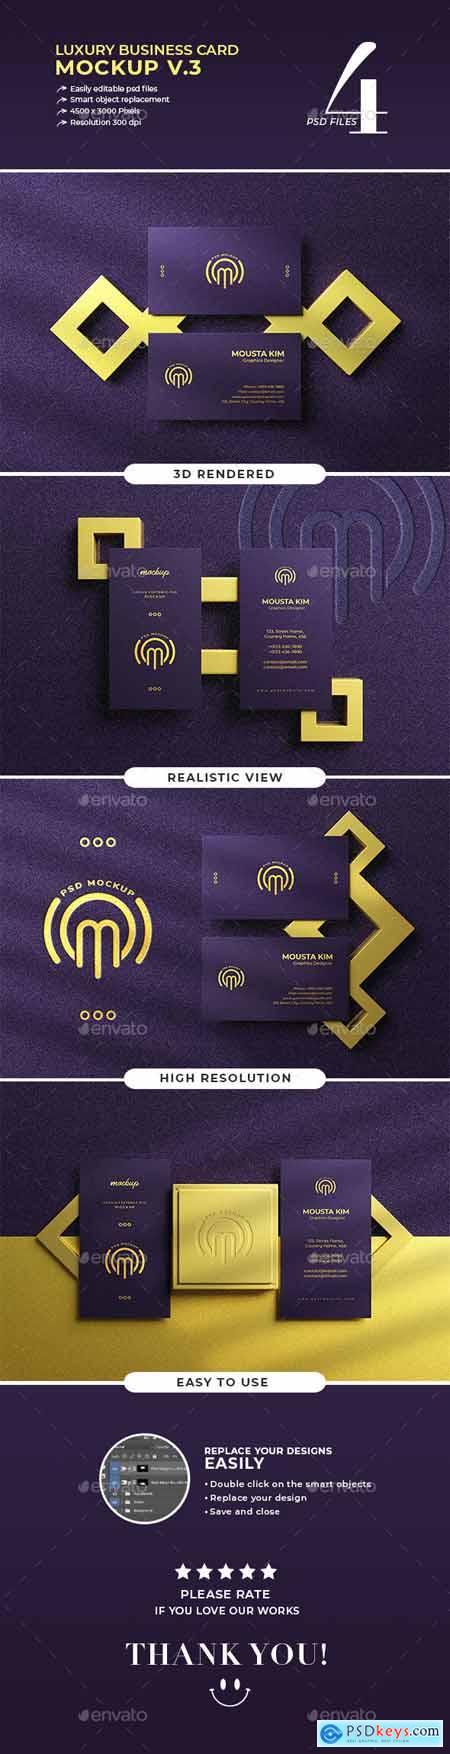 Luxury business card mockup v.3 30098520